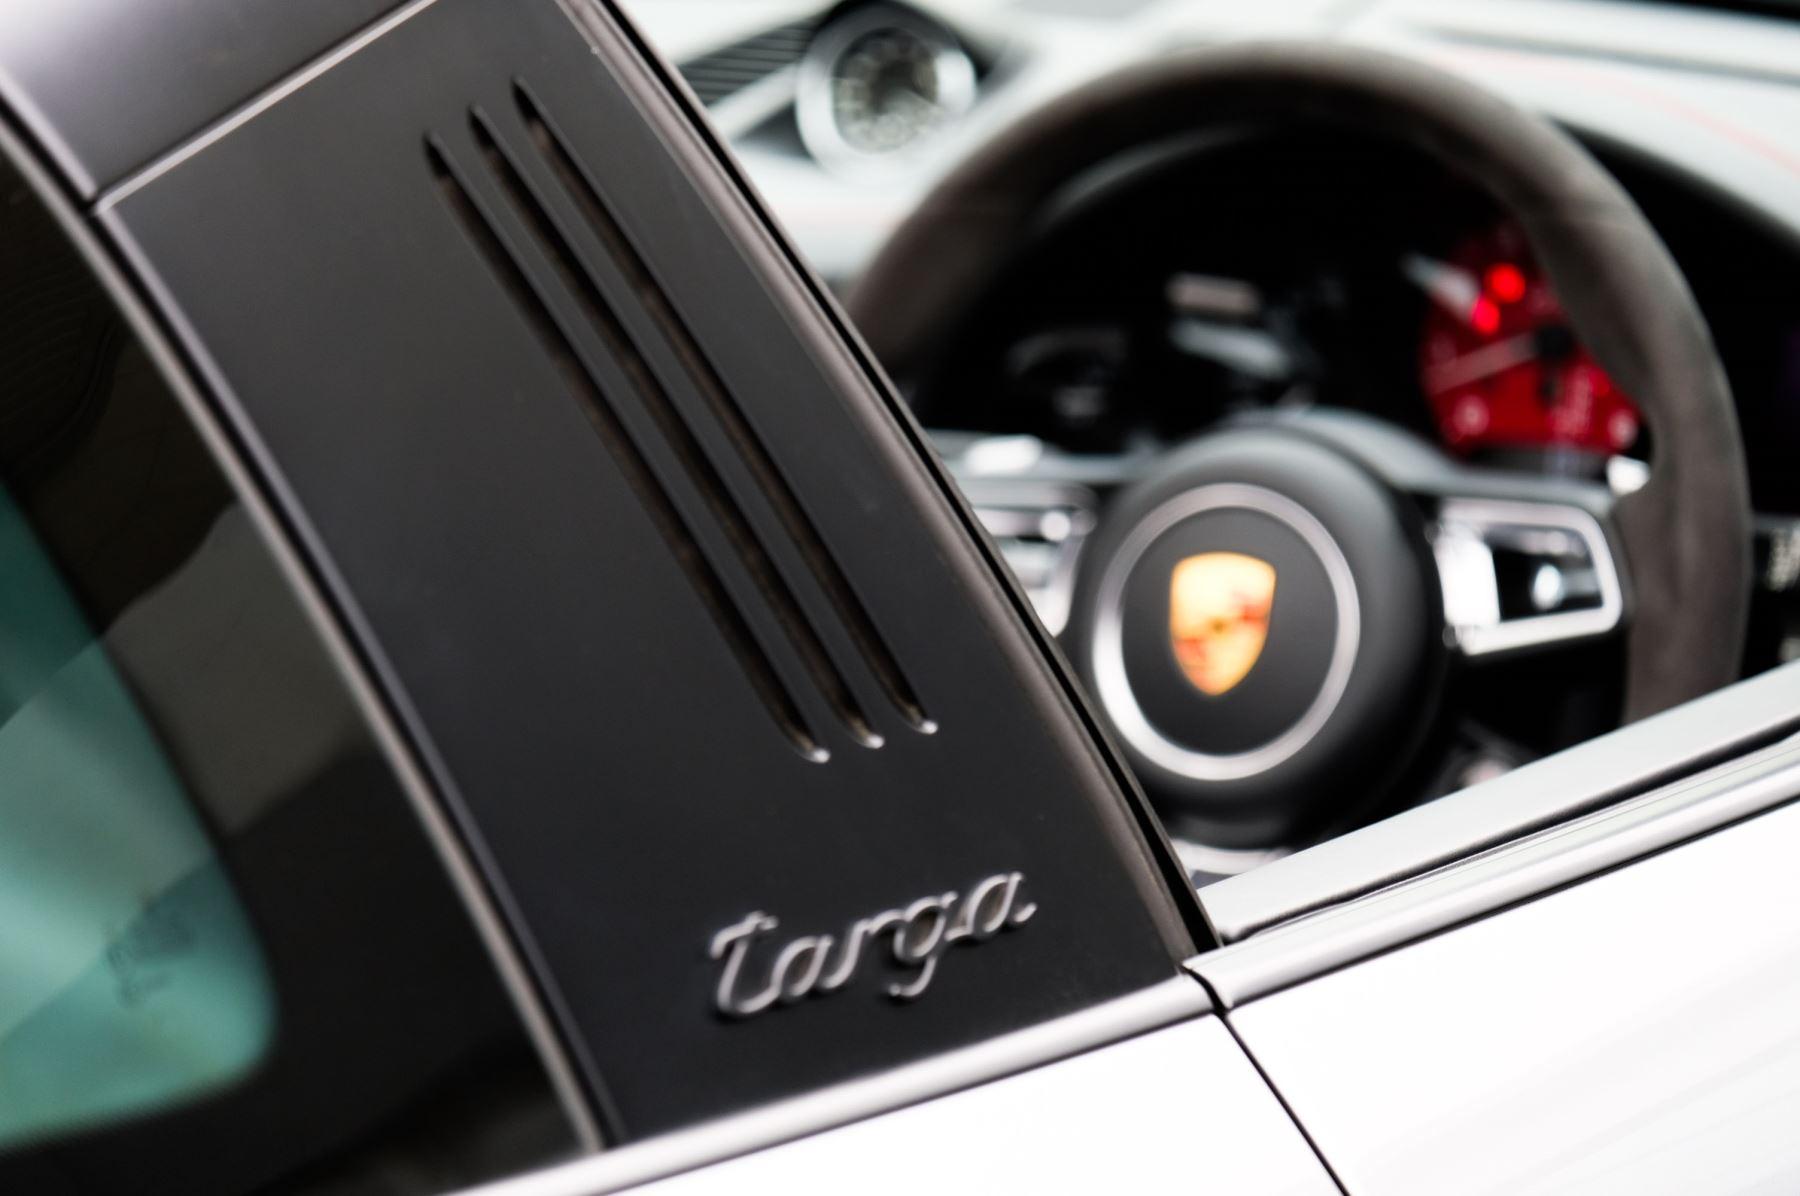 Porsche 911 TARGA 4 GTS - PDK - SPORT DESIGN PACKAGE - GTS INTERIOR PACKAGE image 13